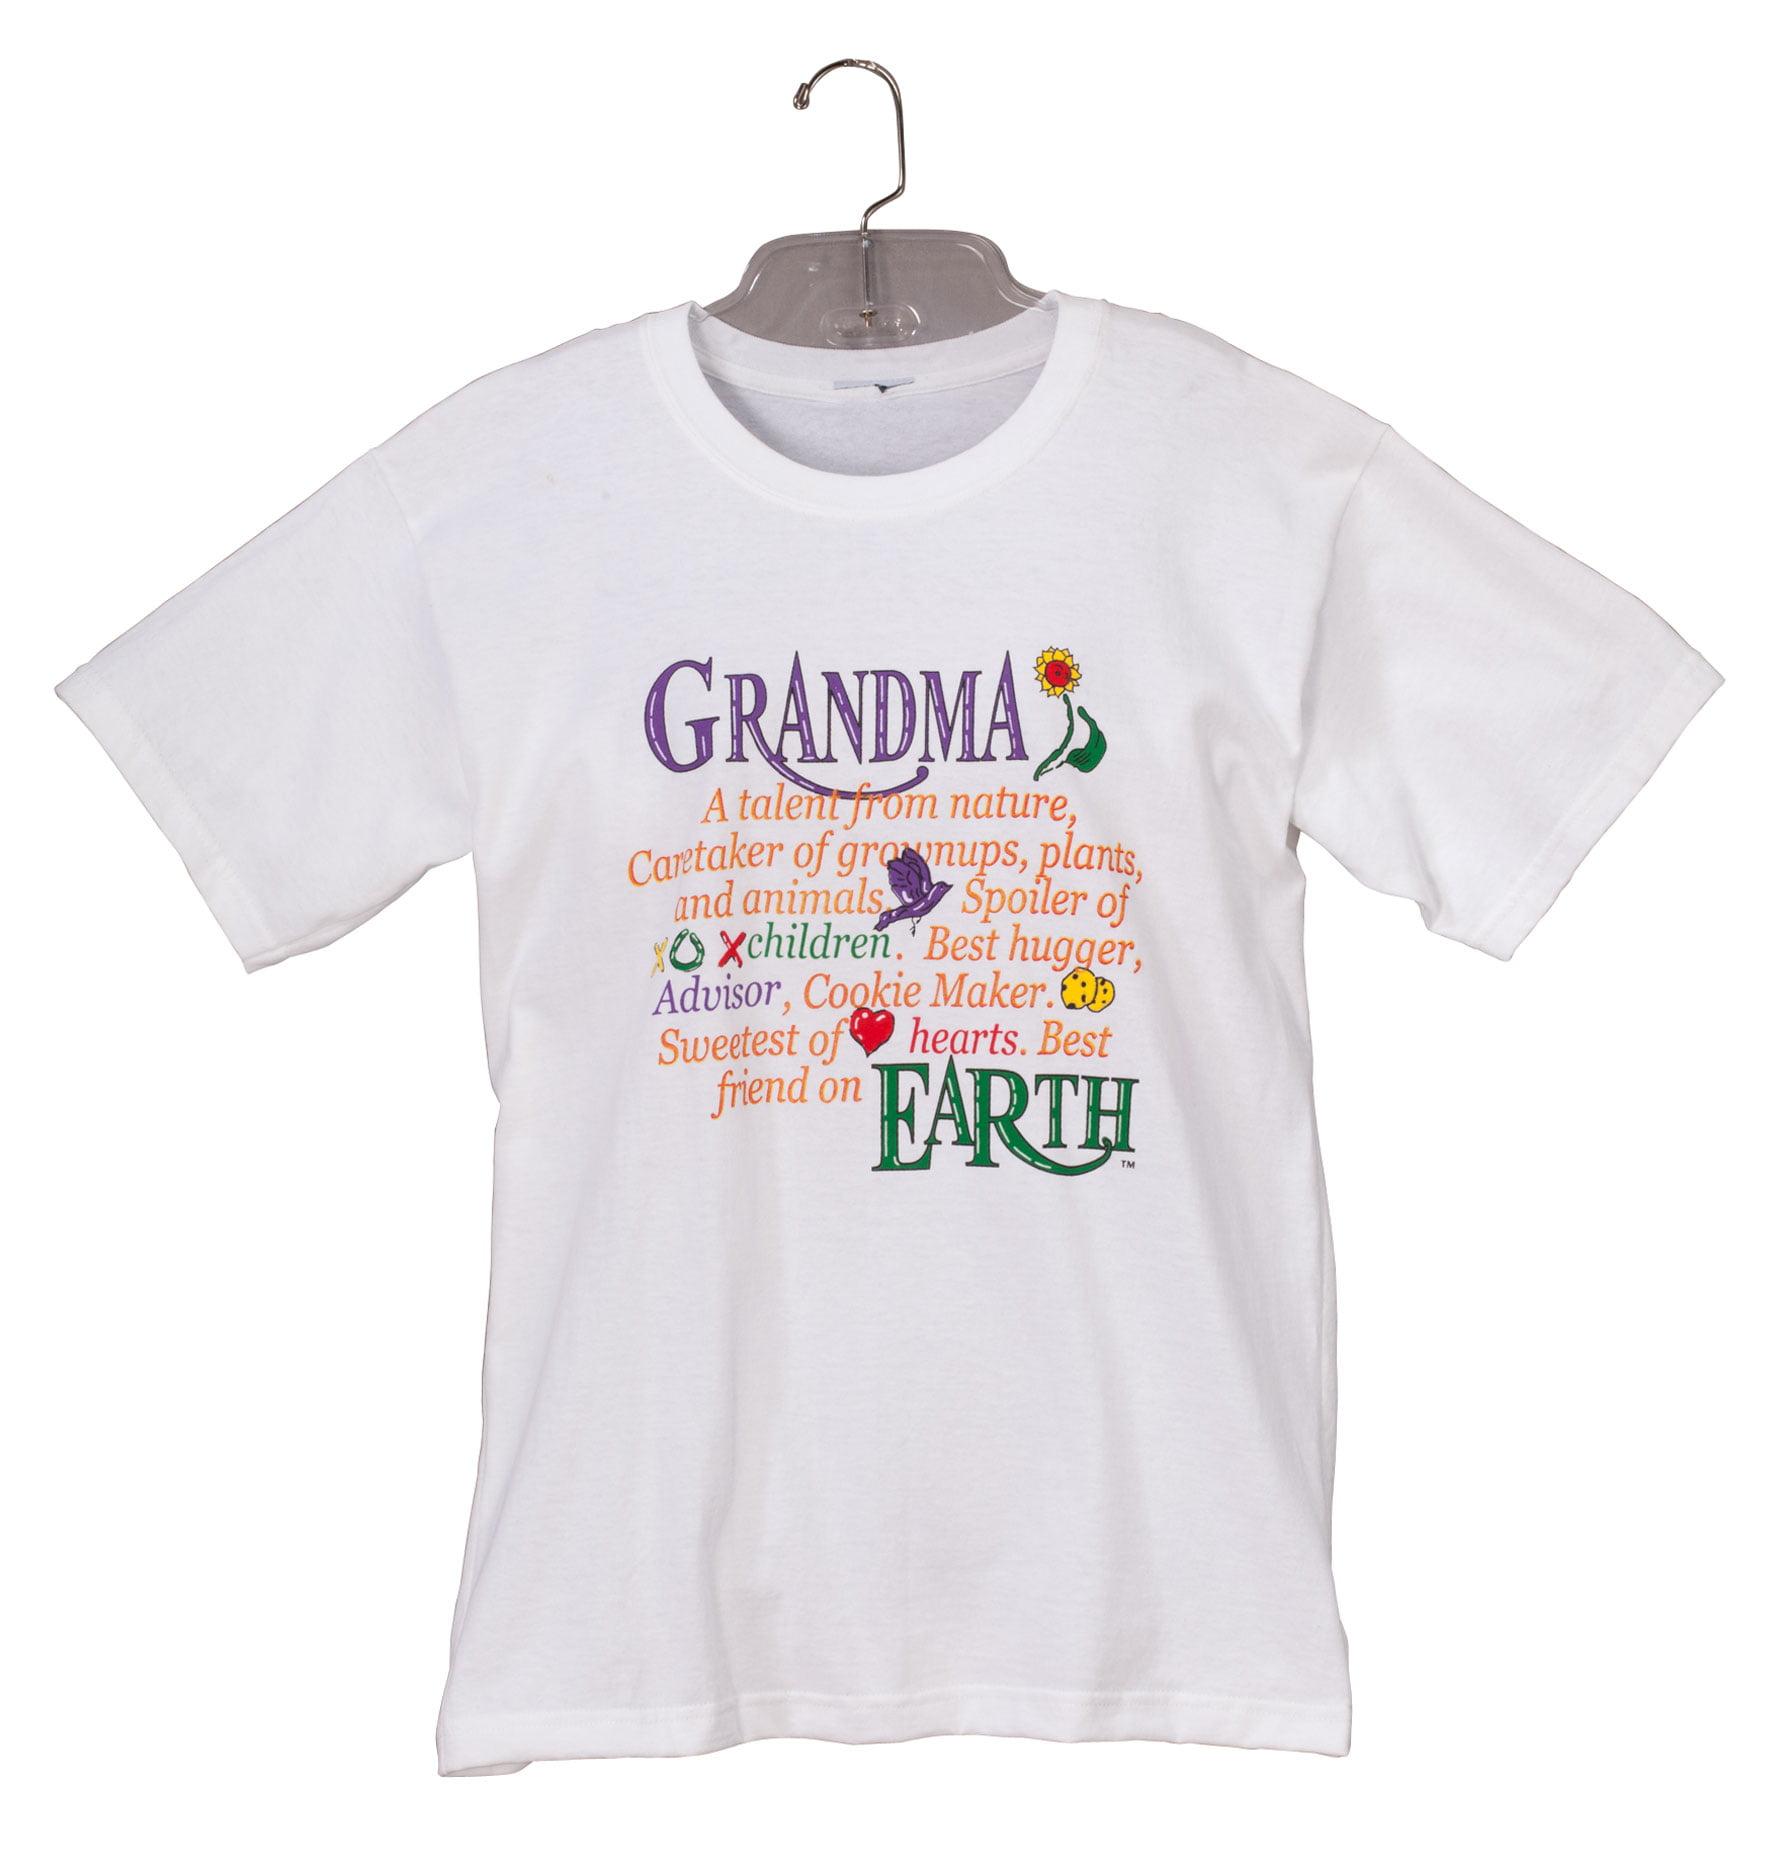 98a38c03 Fox Valley Traders - Grandma T-Shirt - Walmart.com